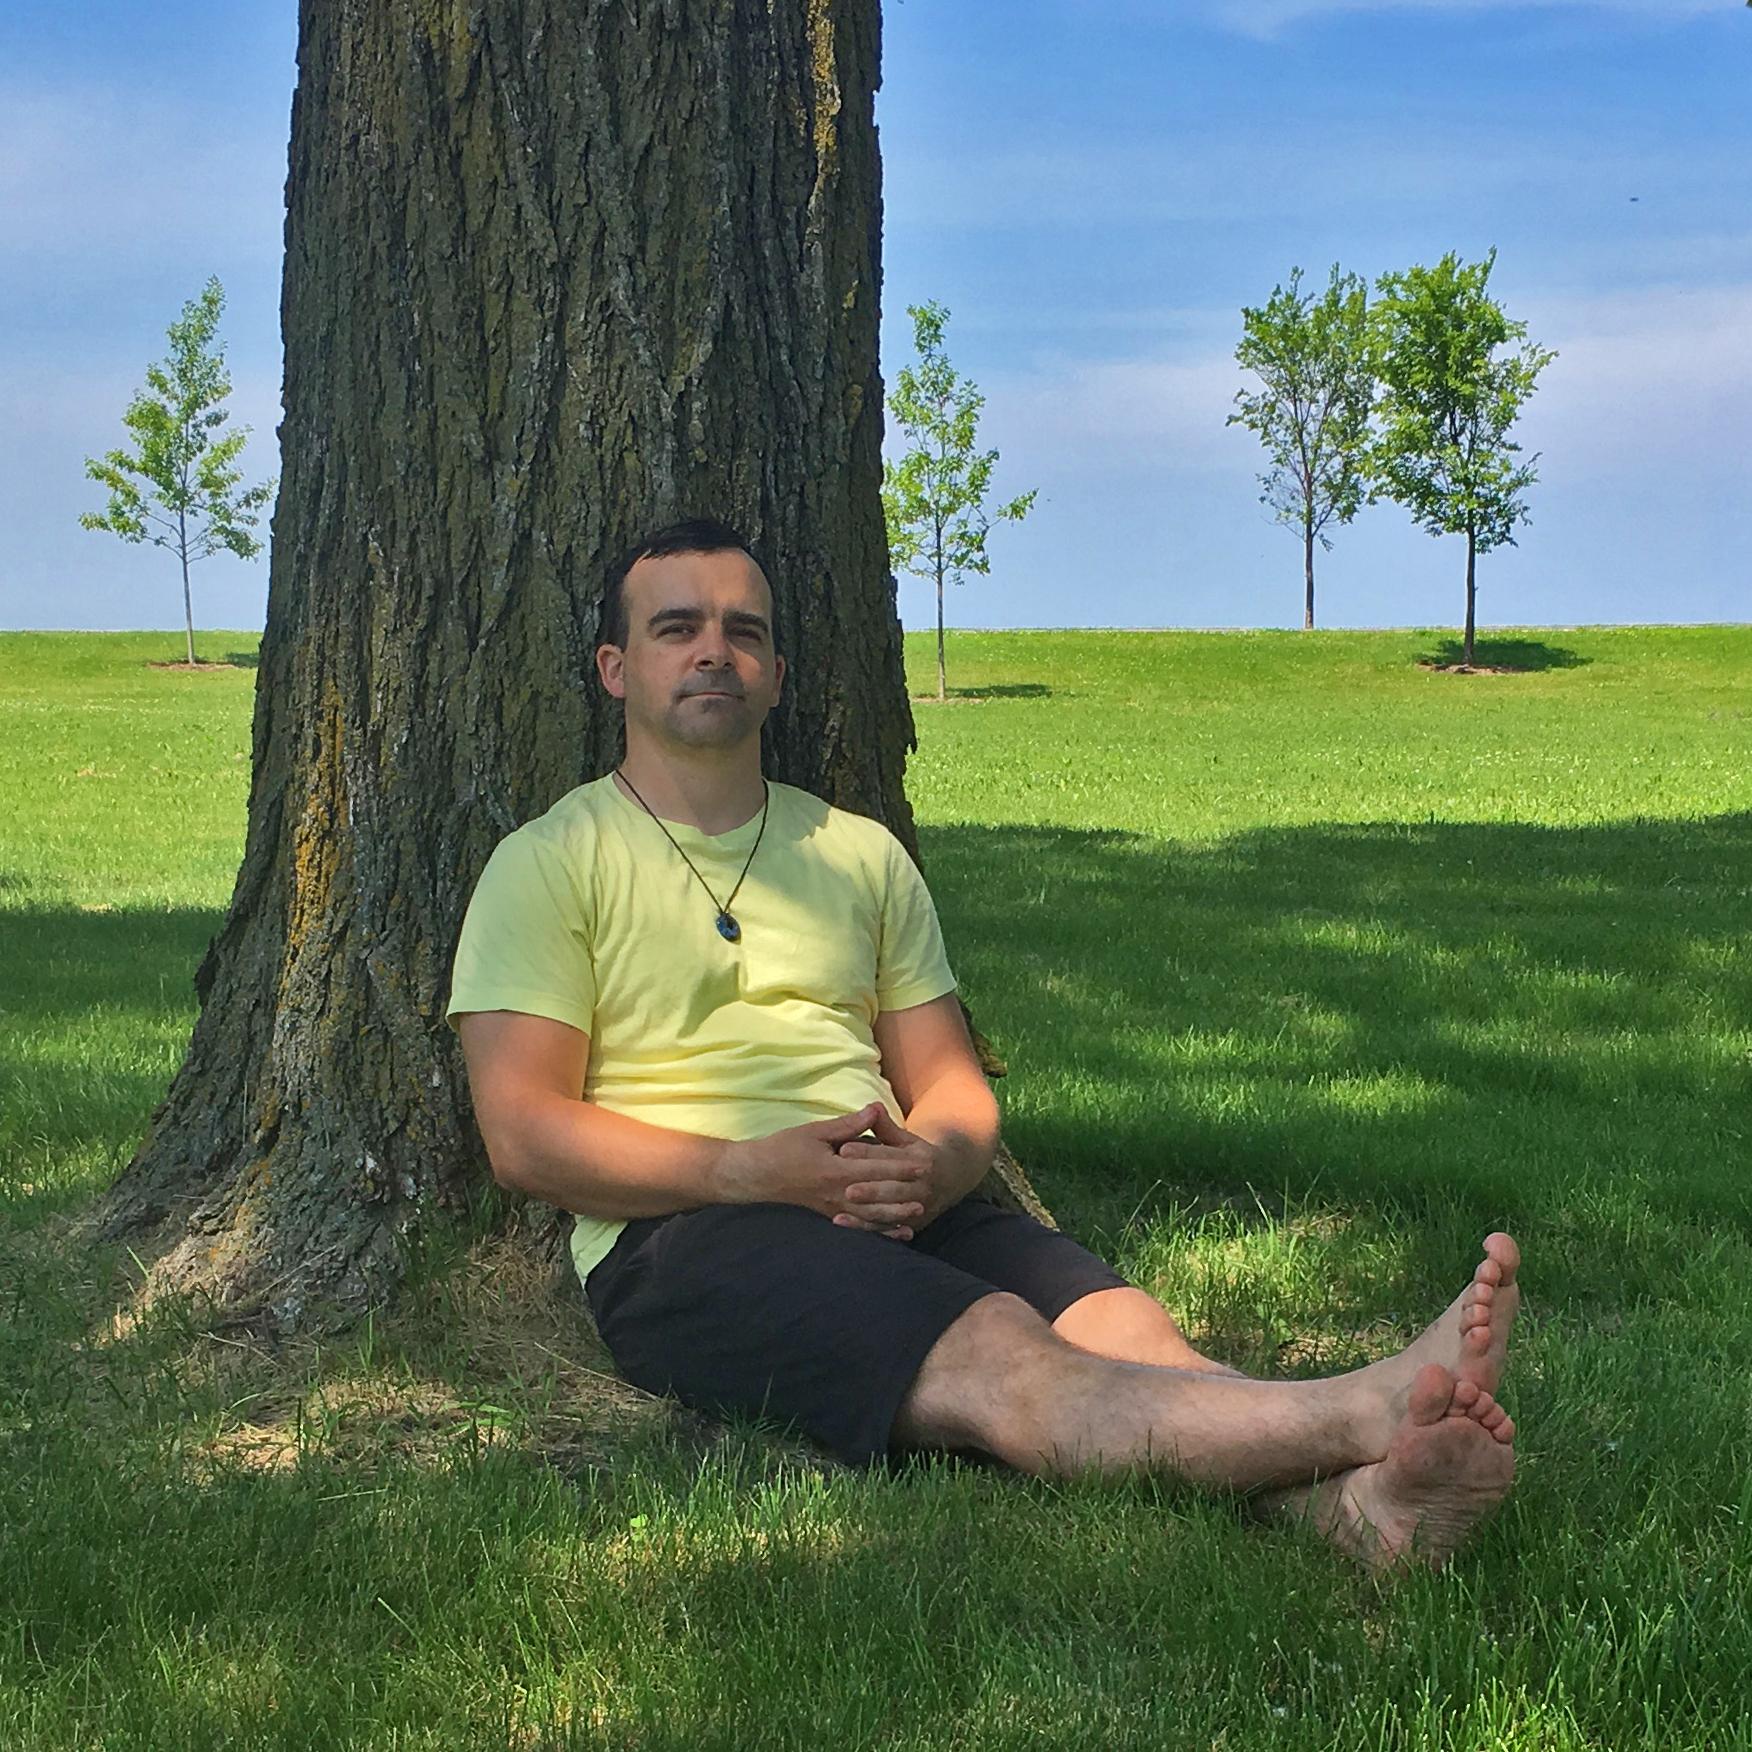 2019-adam-grossi-tree-square.jpg